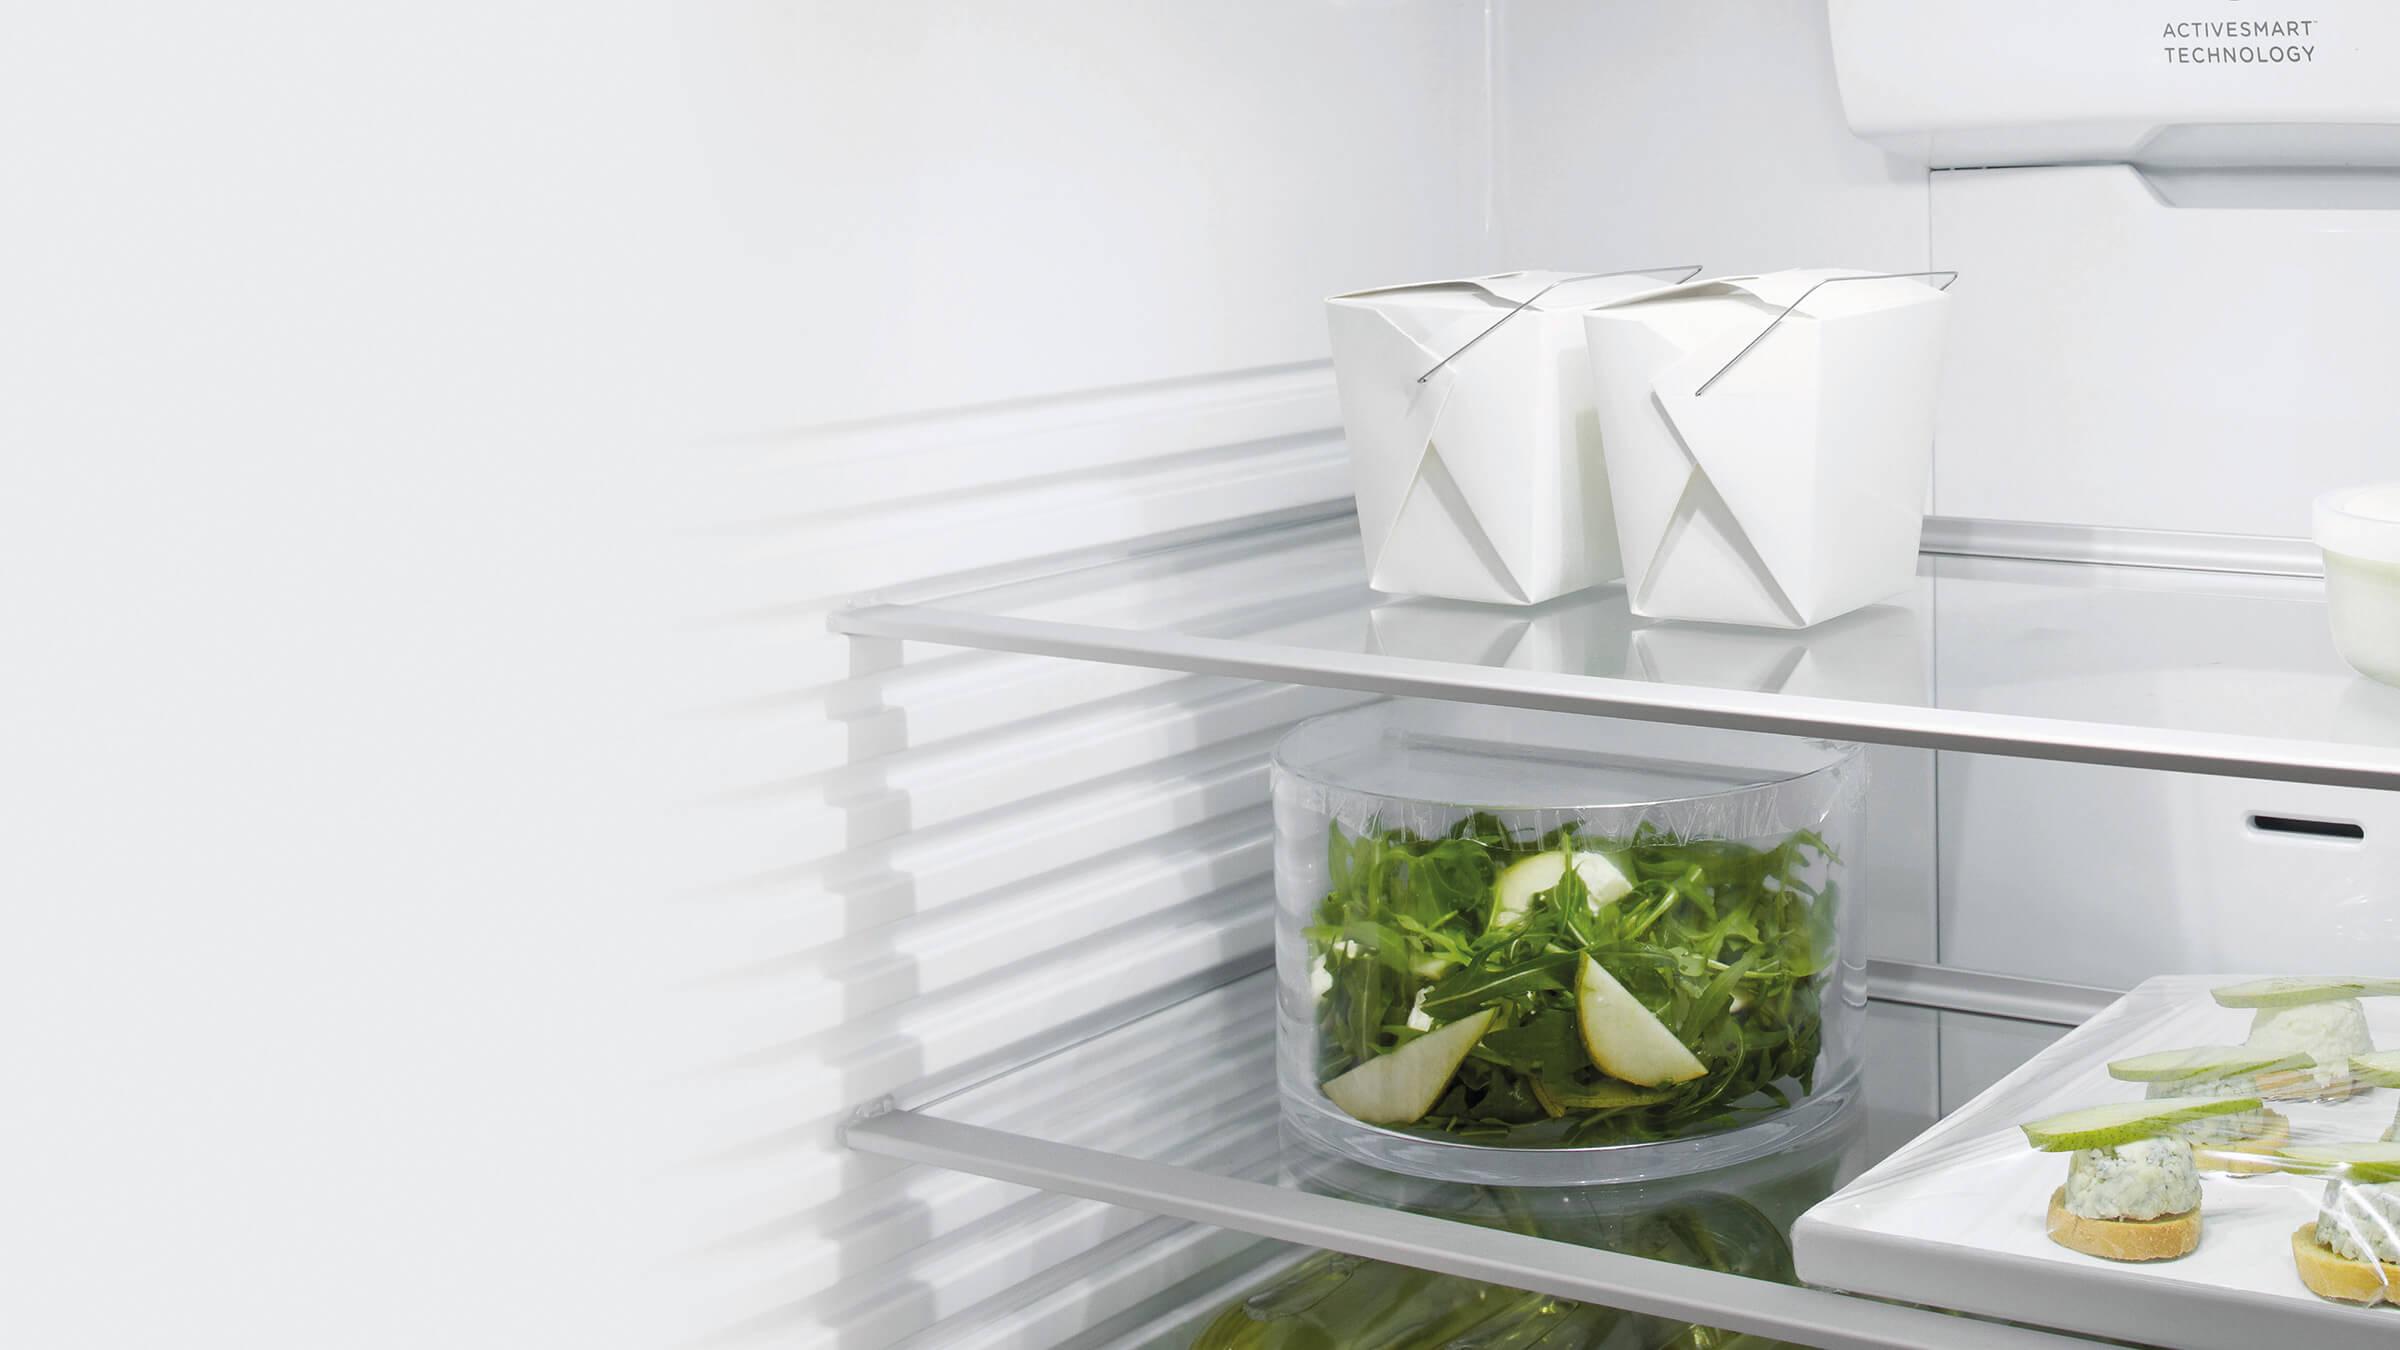 Model: RF170WDRUX5 | Counter Depth Refrigerator 17 cu ft, Ice & Water